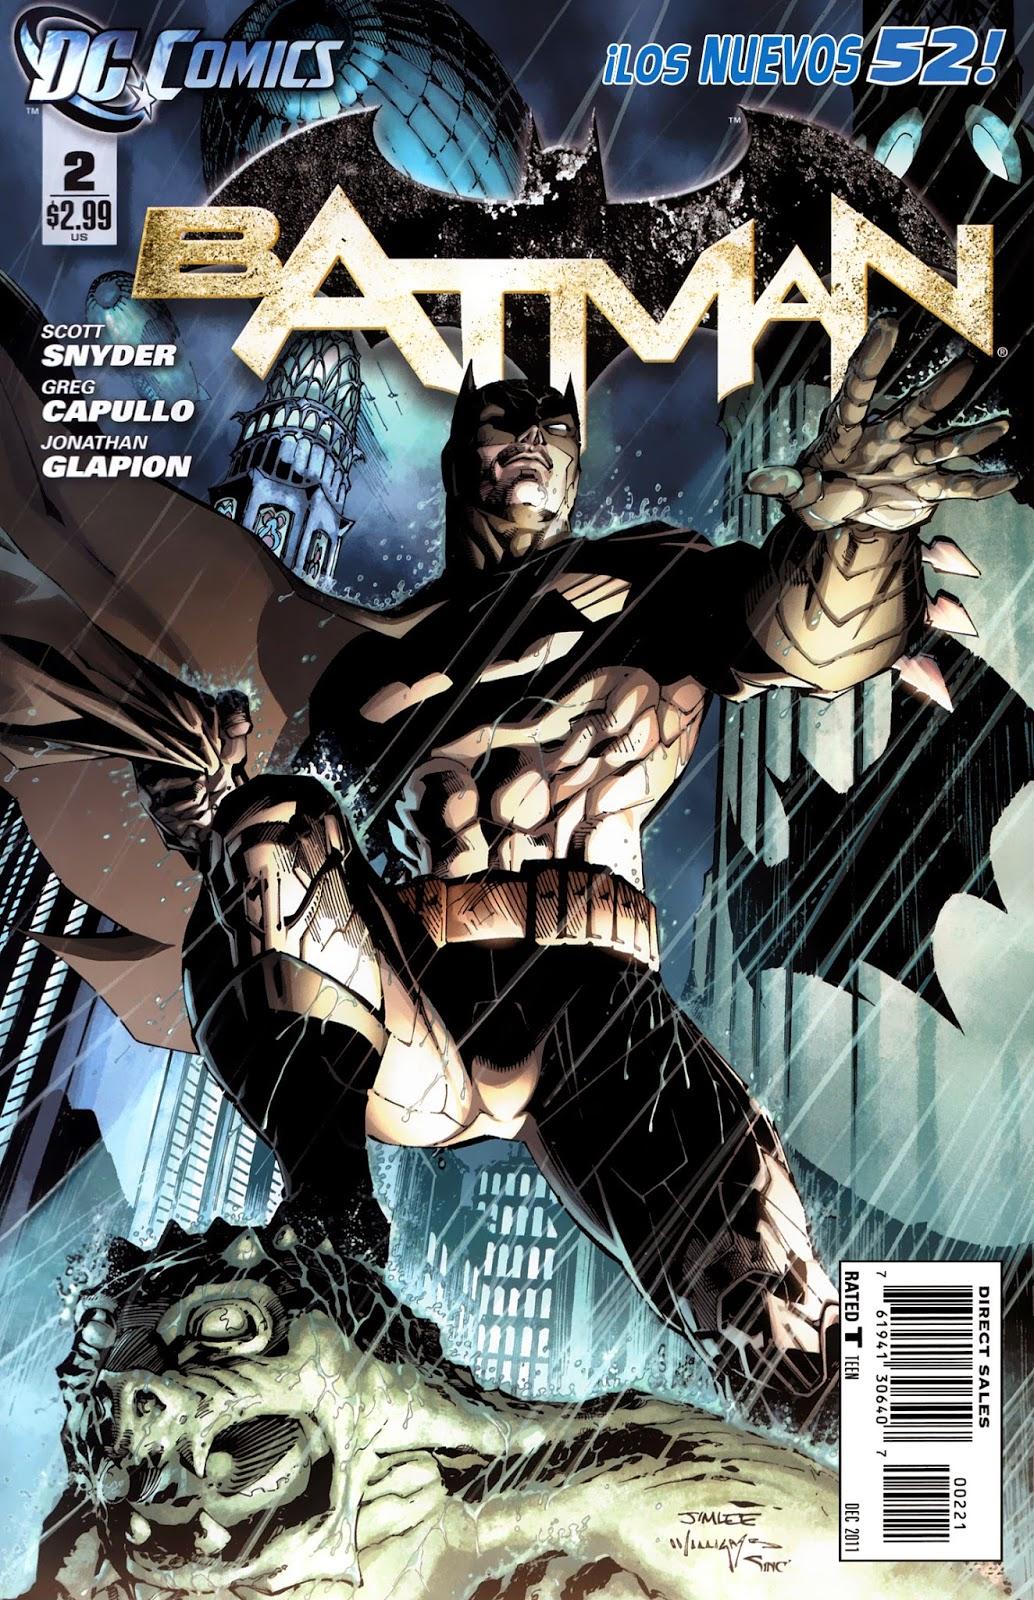 http://www.mediafire.com/download/ibqcxsbx9dhpri1/Batman+2+%28PK+DG%29.cbr